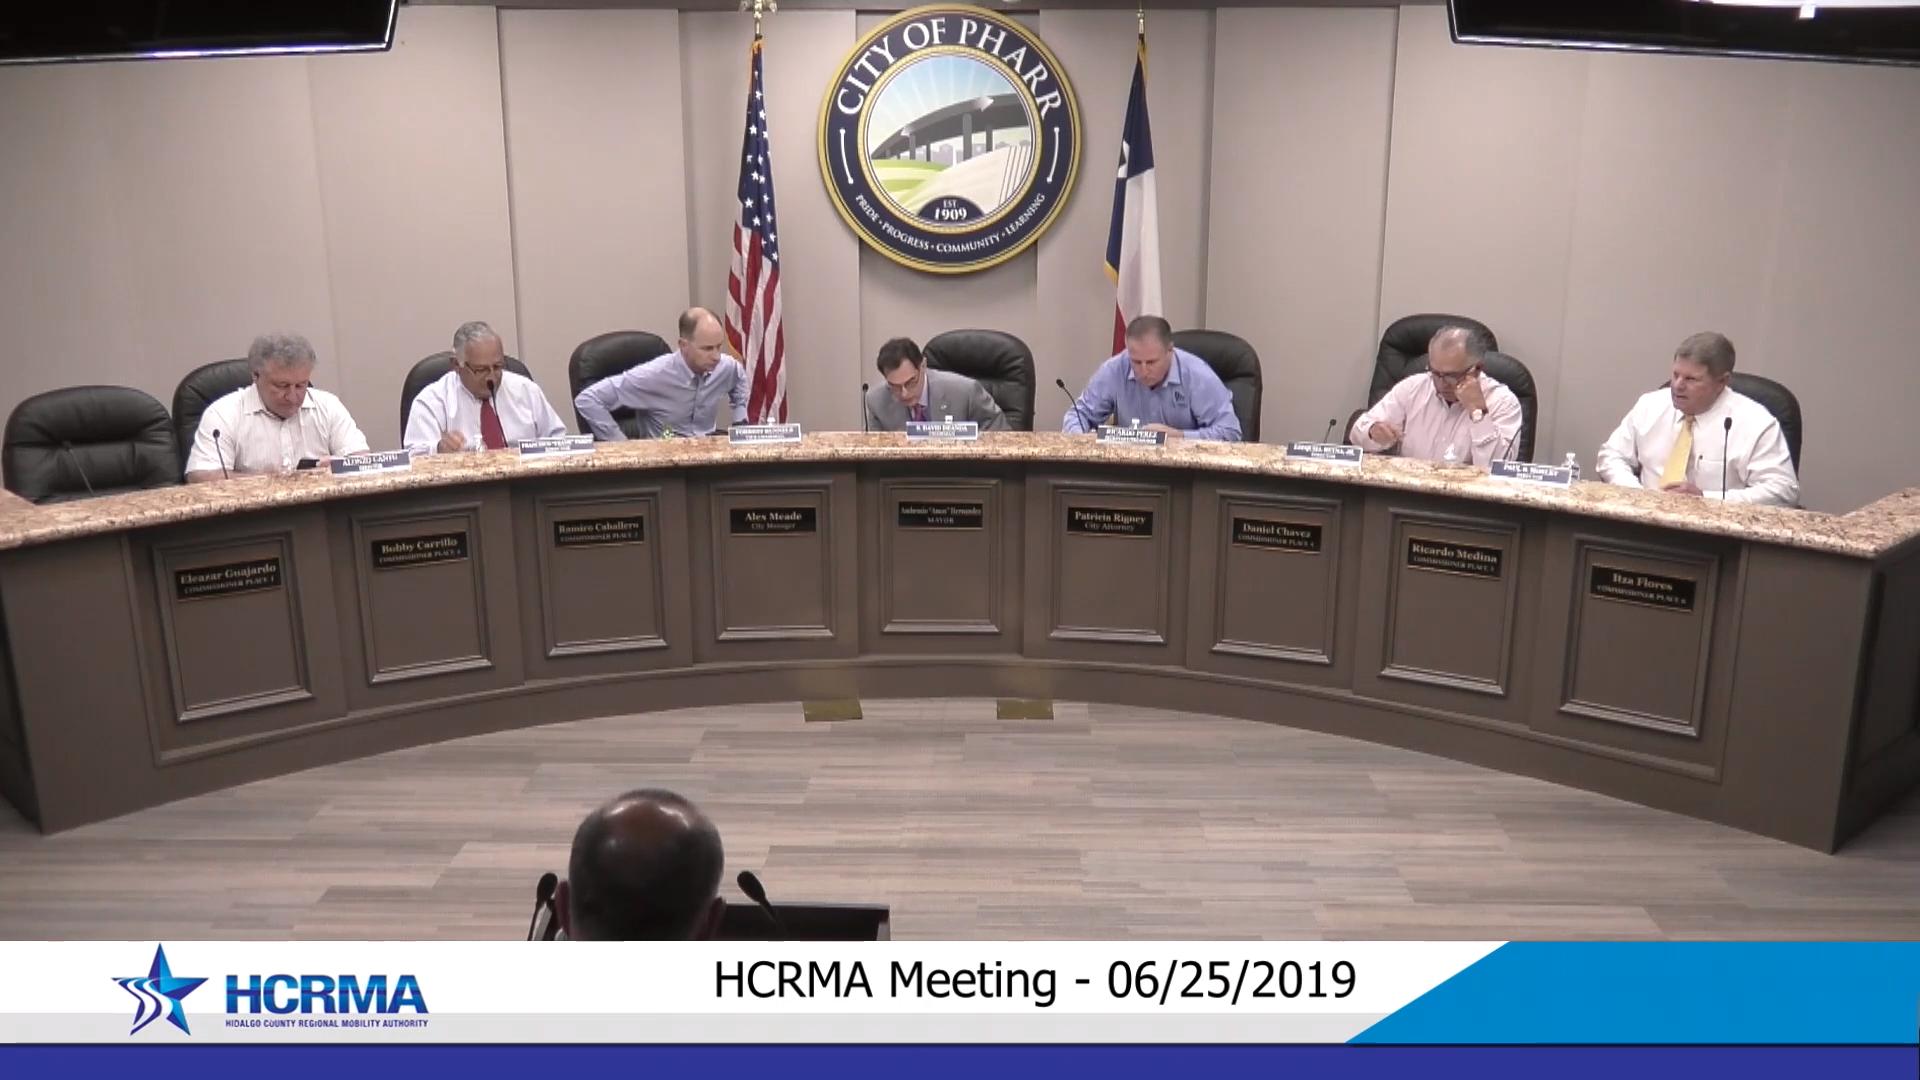 HCRMA Board Meeting – June 25th, 2019